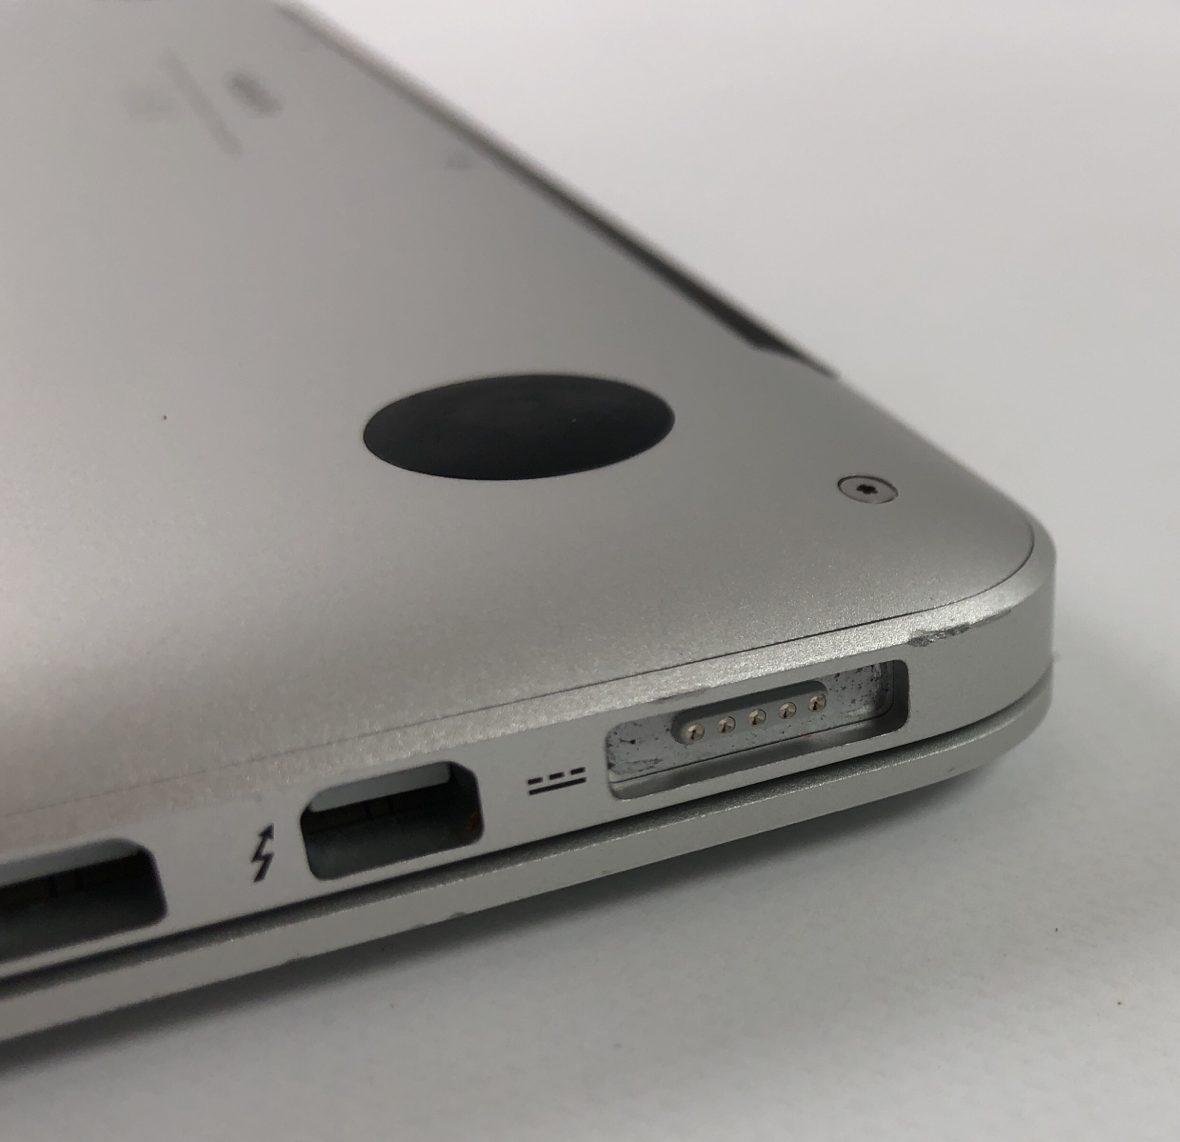 "MacBook Pro Retina 13"" Early 2015 (Intel Core i5 2.7 GHz 16 GB RAM 256 GB SSD), Intel Core i5 2.7 GHz, 16 GB RAM, 256 GB SSD, Kuva 4"